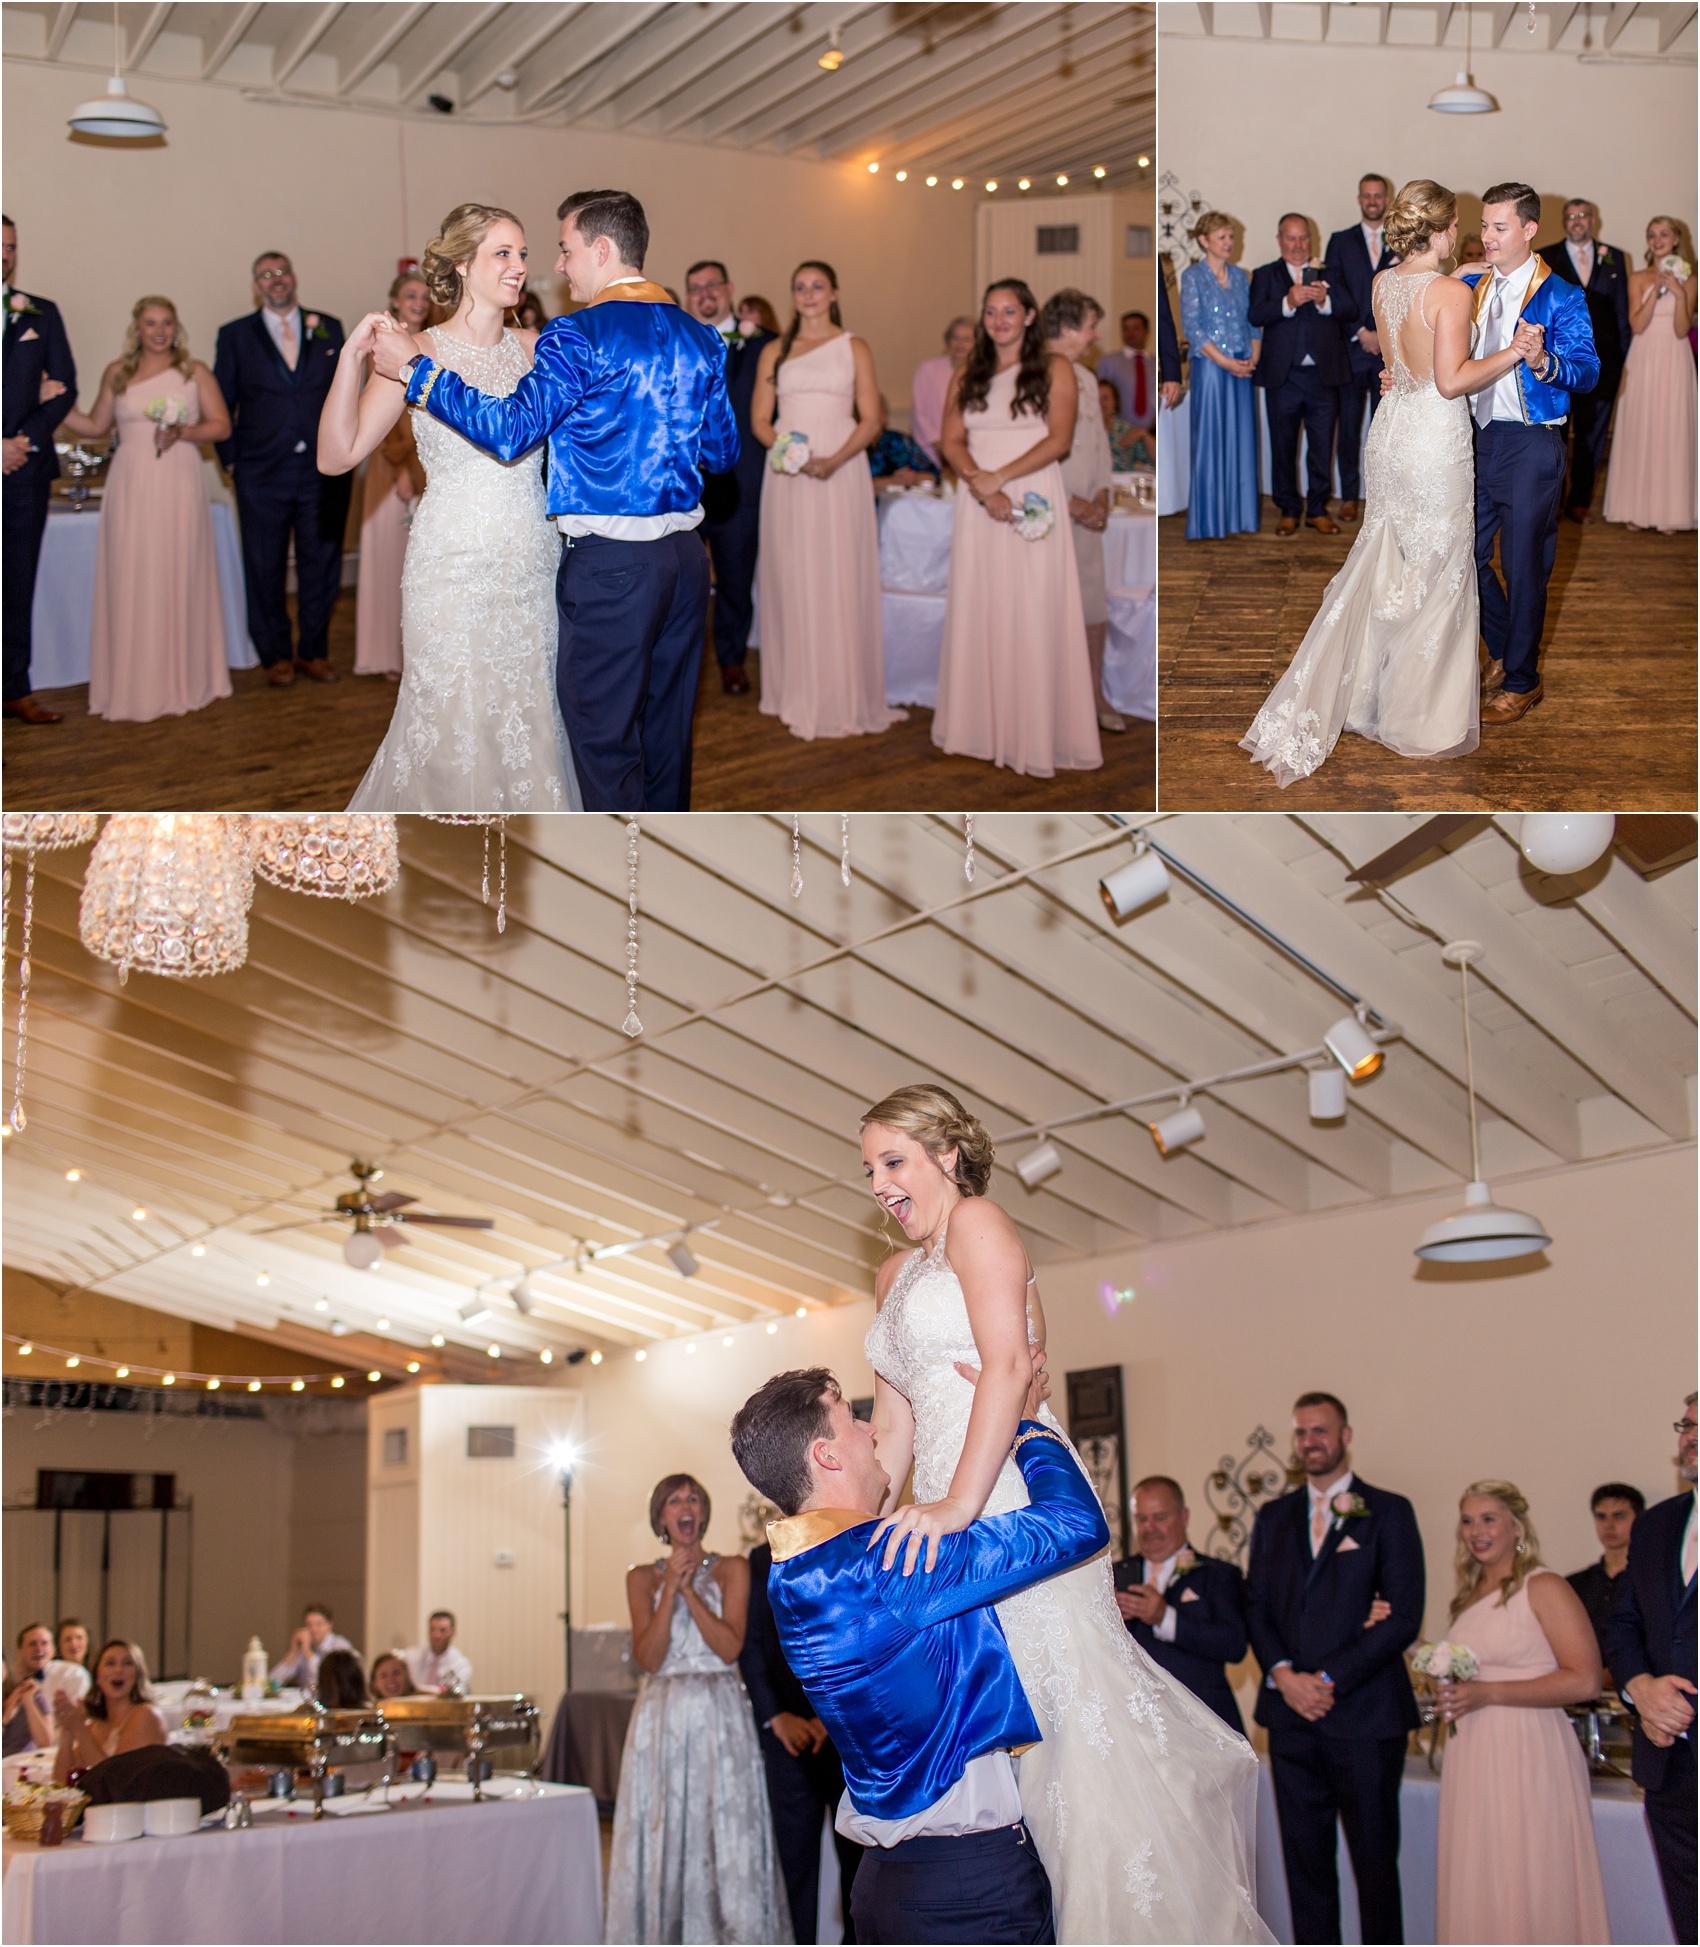 Savannah Eve Photography- Roper-Powell Wedding- Blog-56.jpg